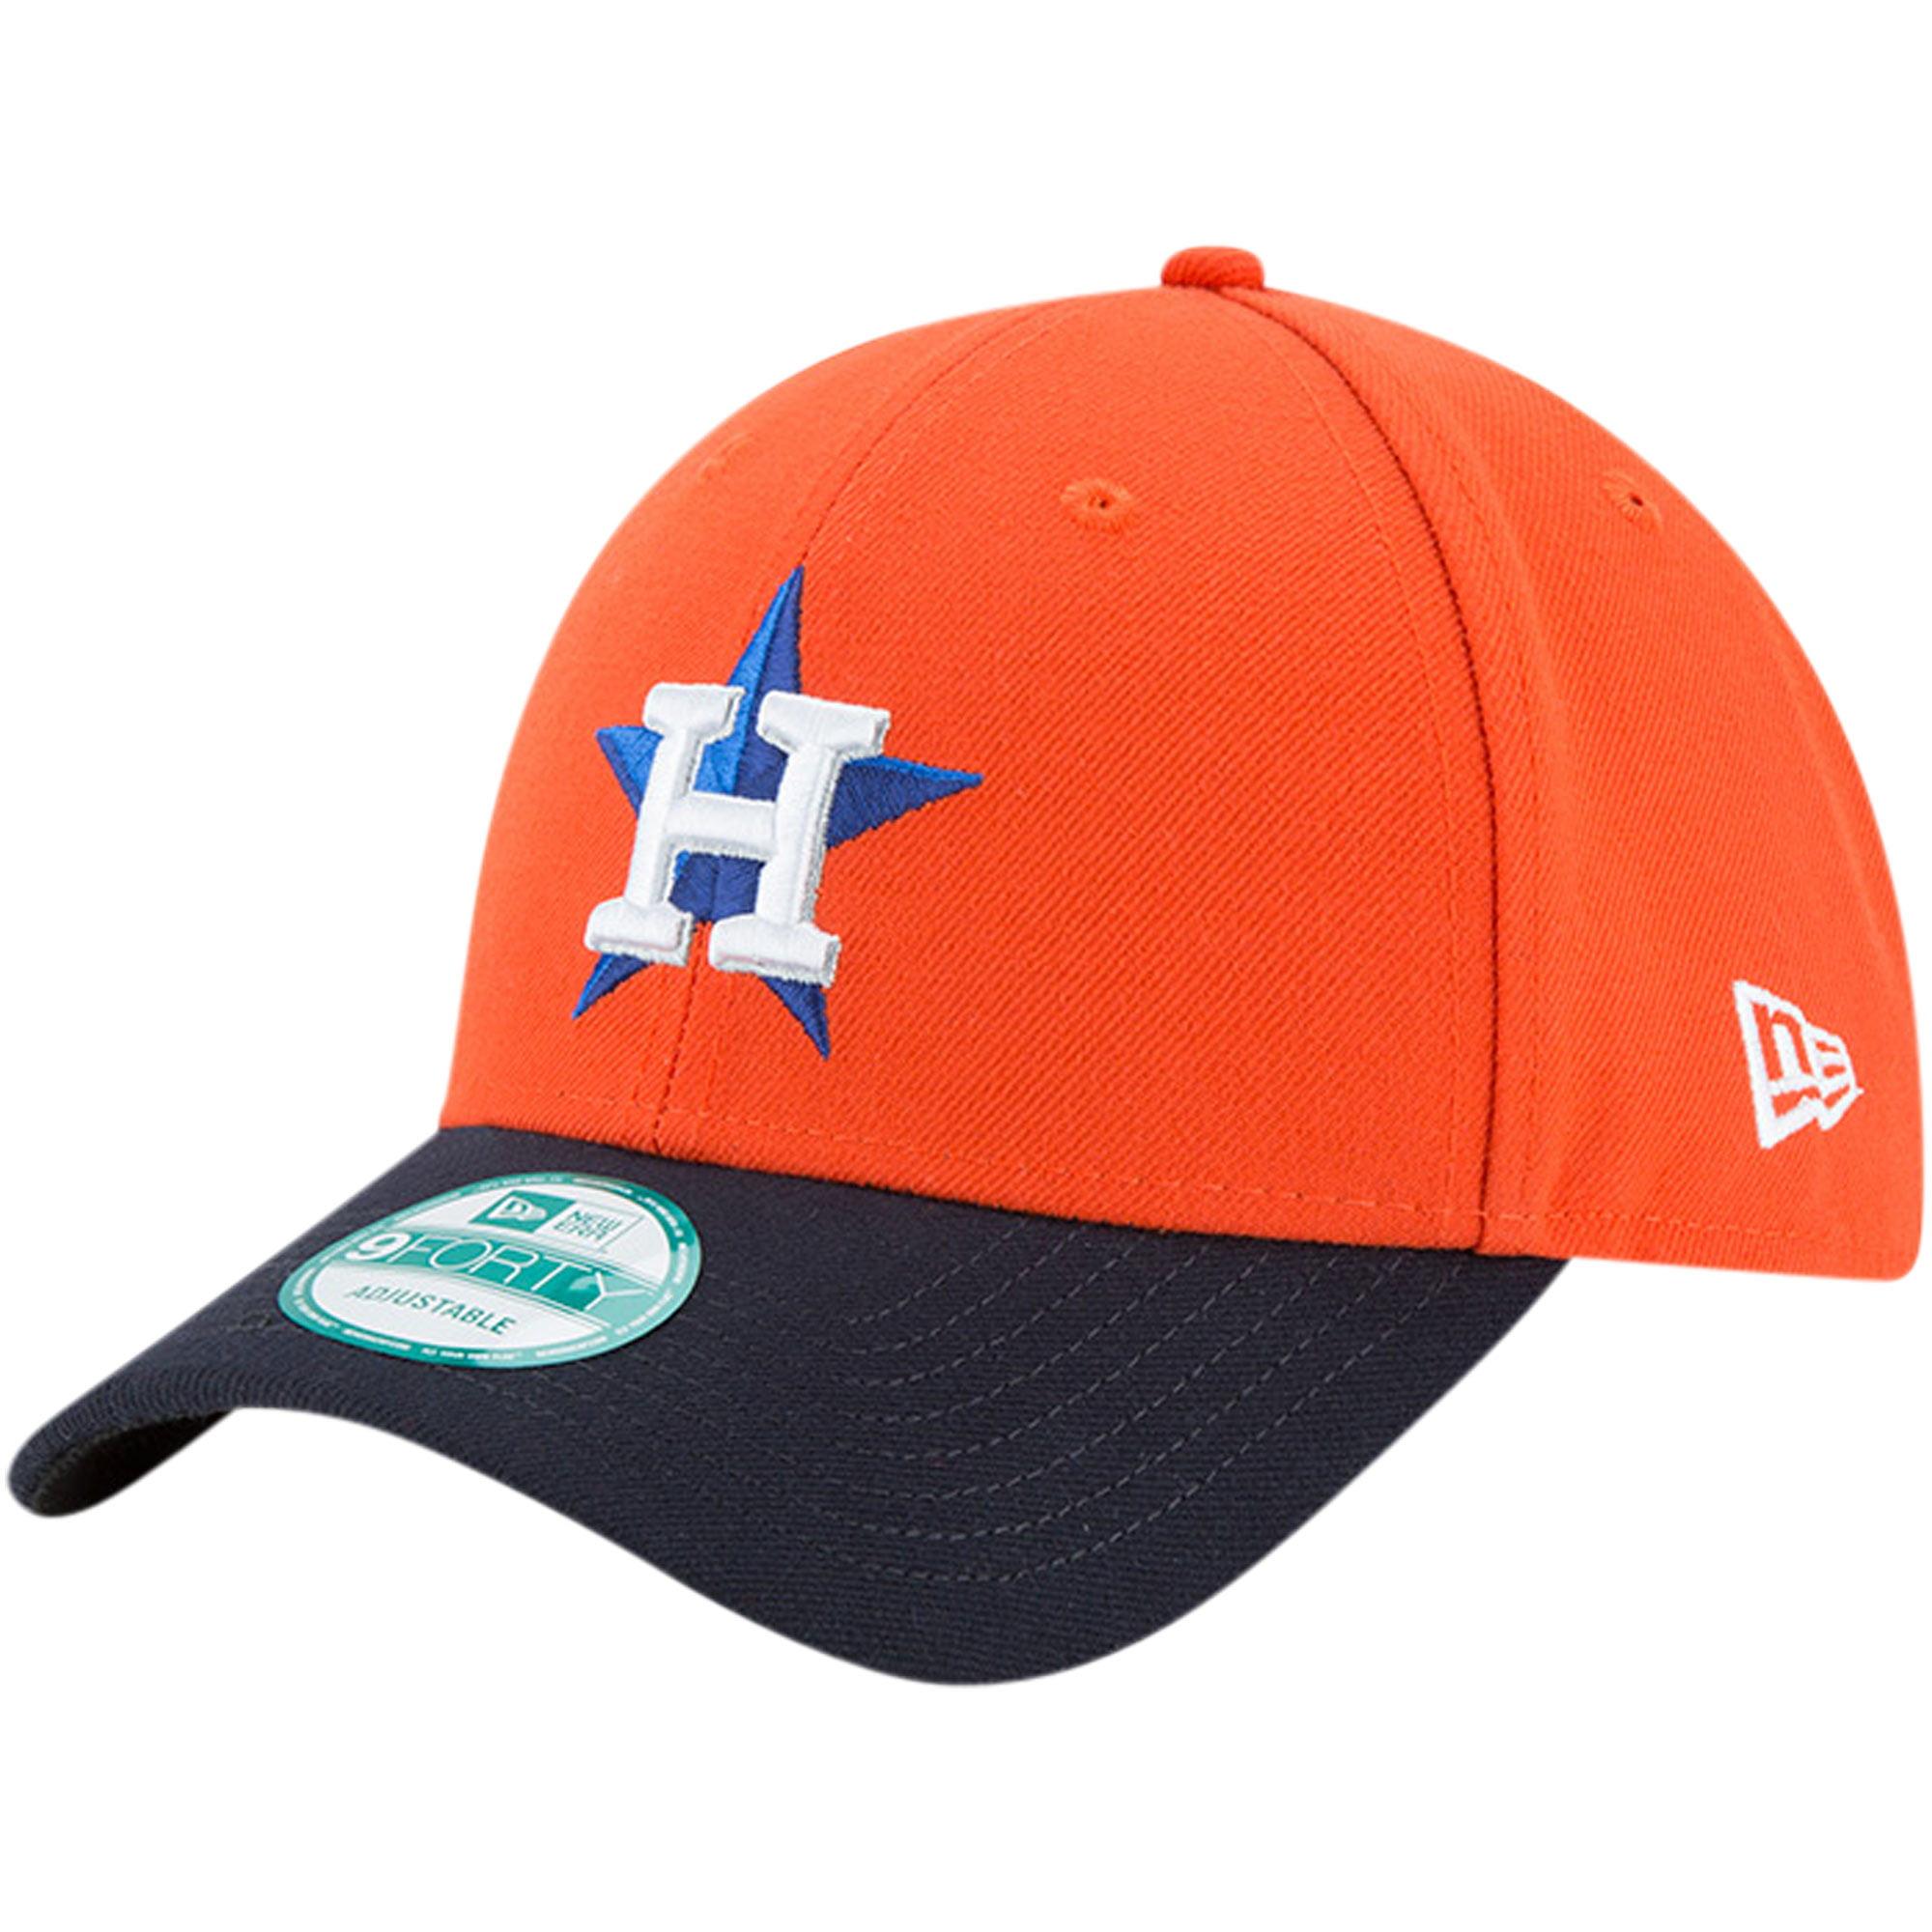 Houston Astros New Era The League Alternate 9FORTY Adjustable Hat - Orange/Navy - OSFA